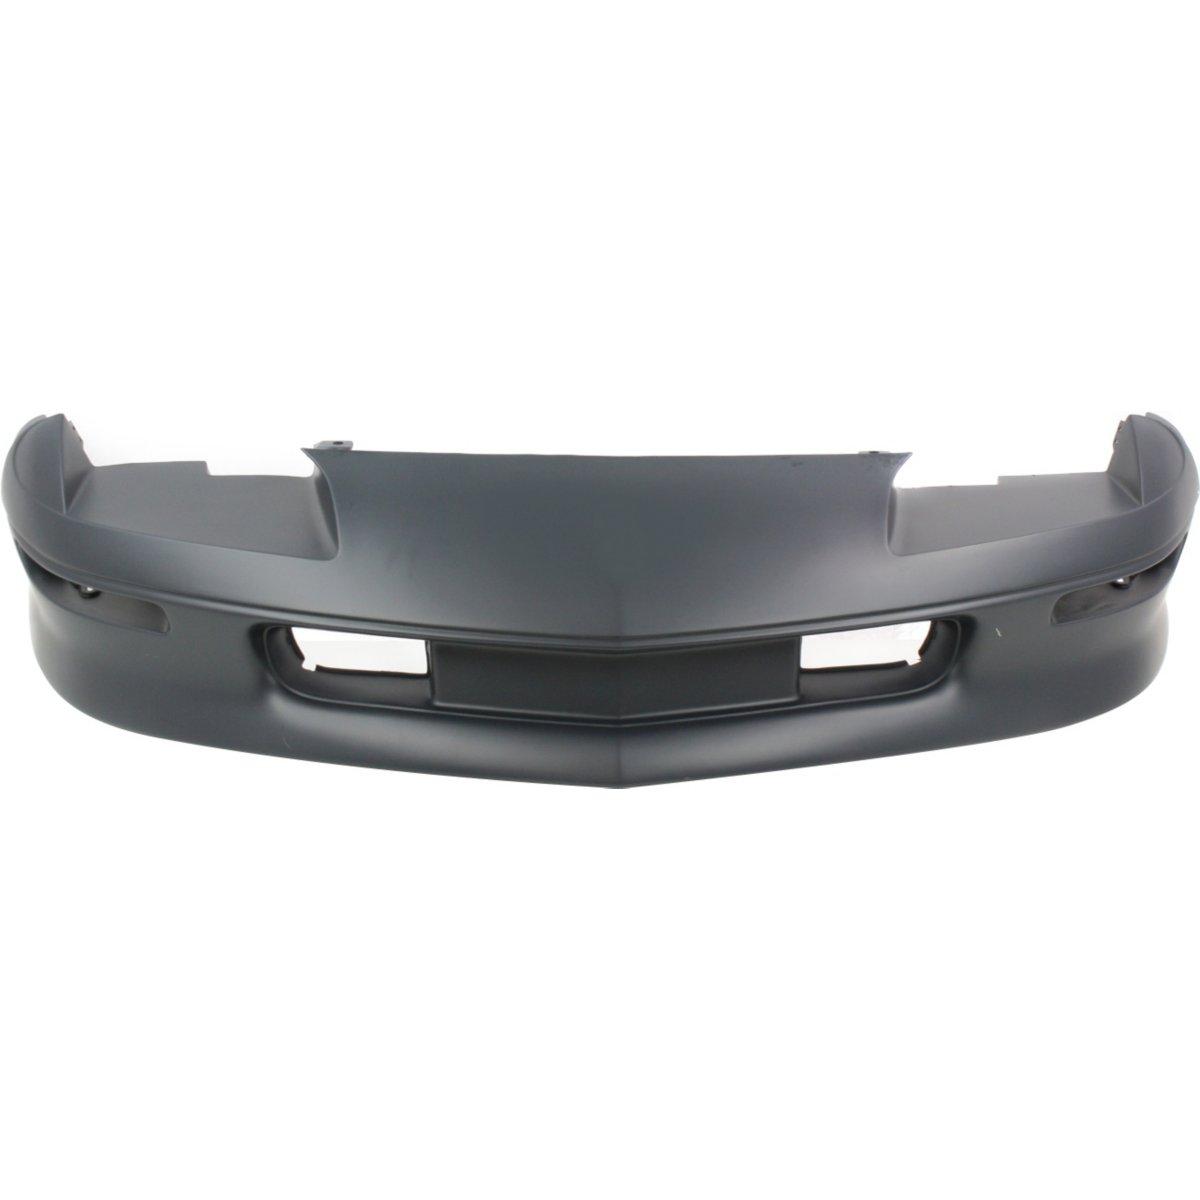 primered new bumper cover front chevy 10248139 chevrolet camaro 97 96 95 94 auto ebay. Black Bedroom Furniture Sets. Home Design Ideas